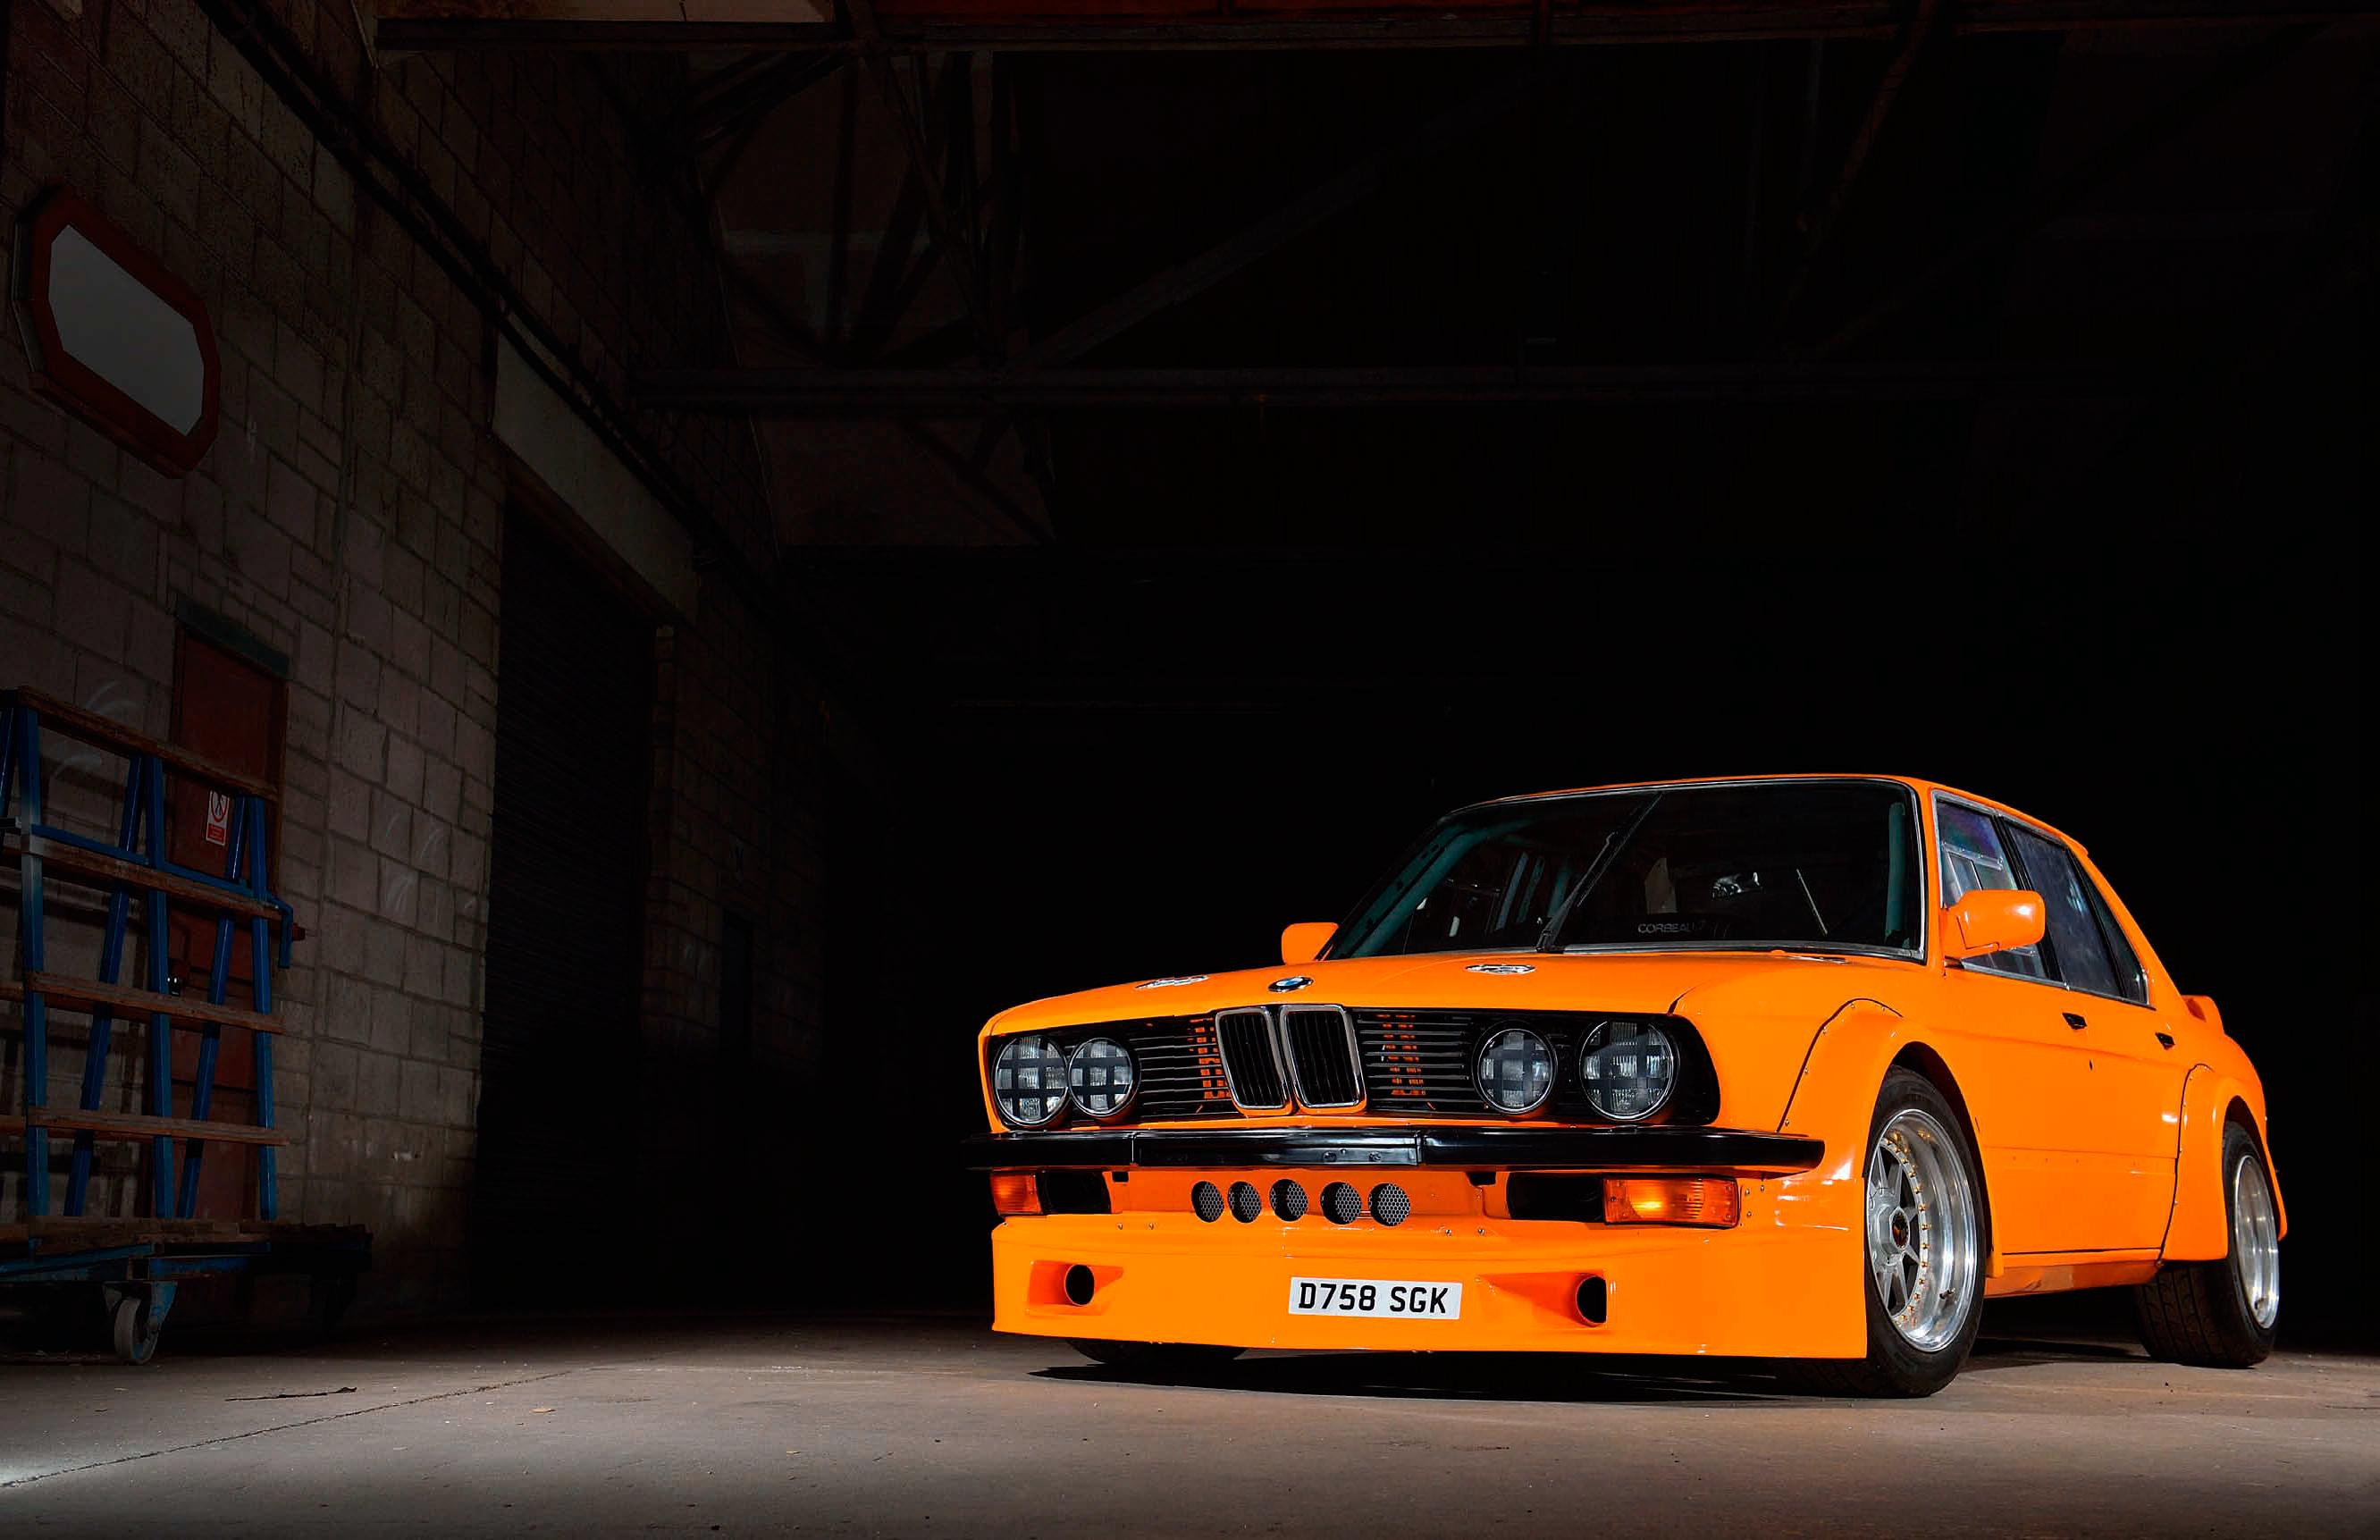 Turner Prize BMW E28 Race Car 360hp S38B38 E34 M5 straight-six ...